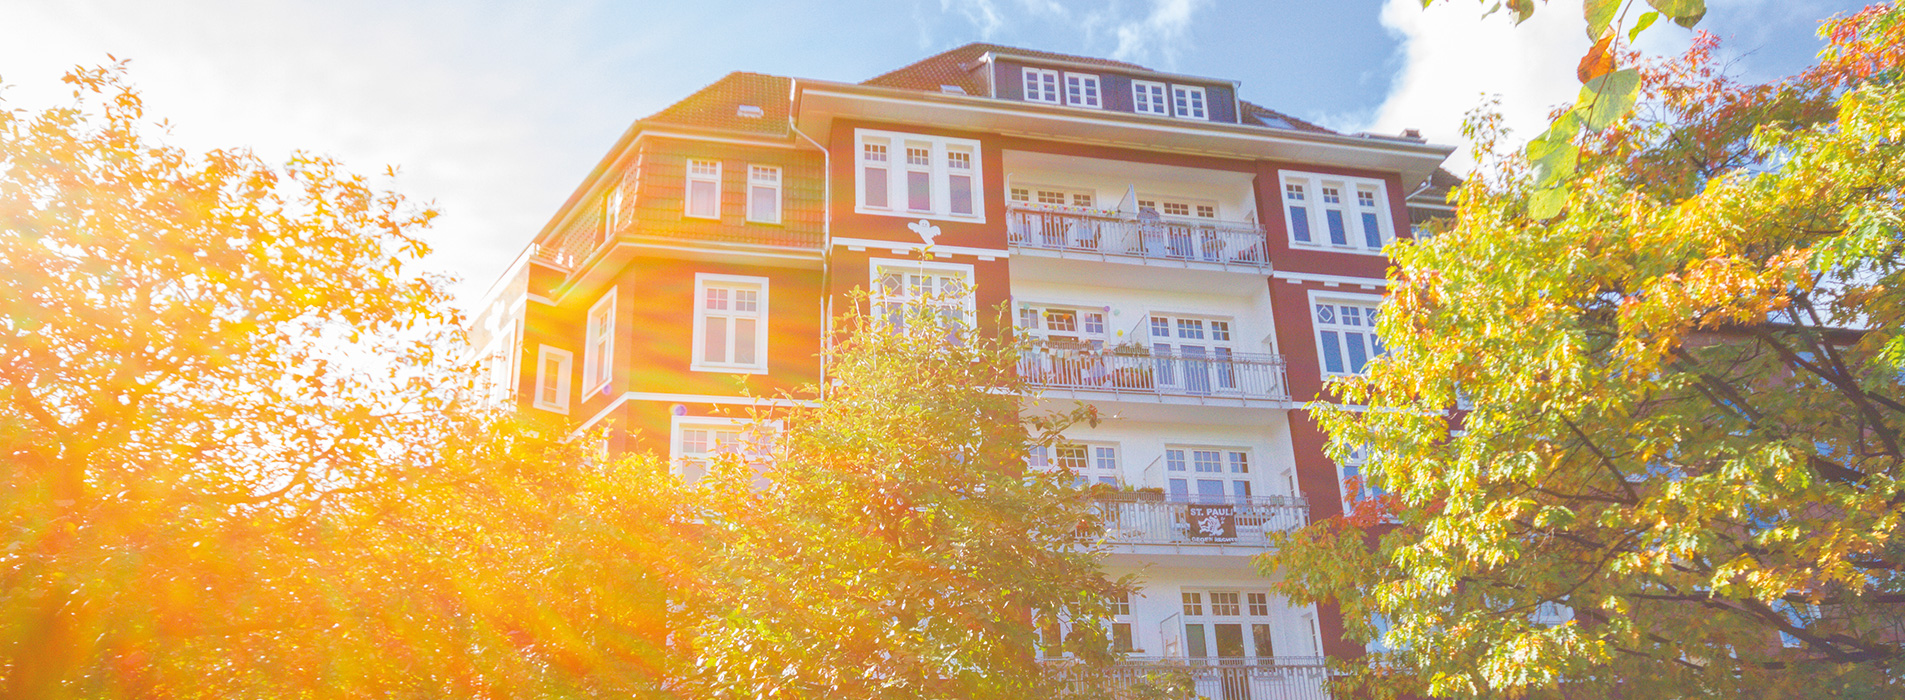 Gebr der geist immobilien immobilienmakler hamburg ggi for Makler immobilien